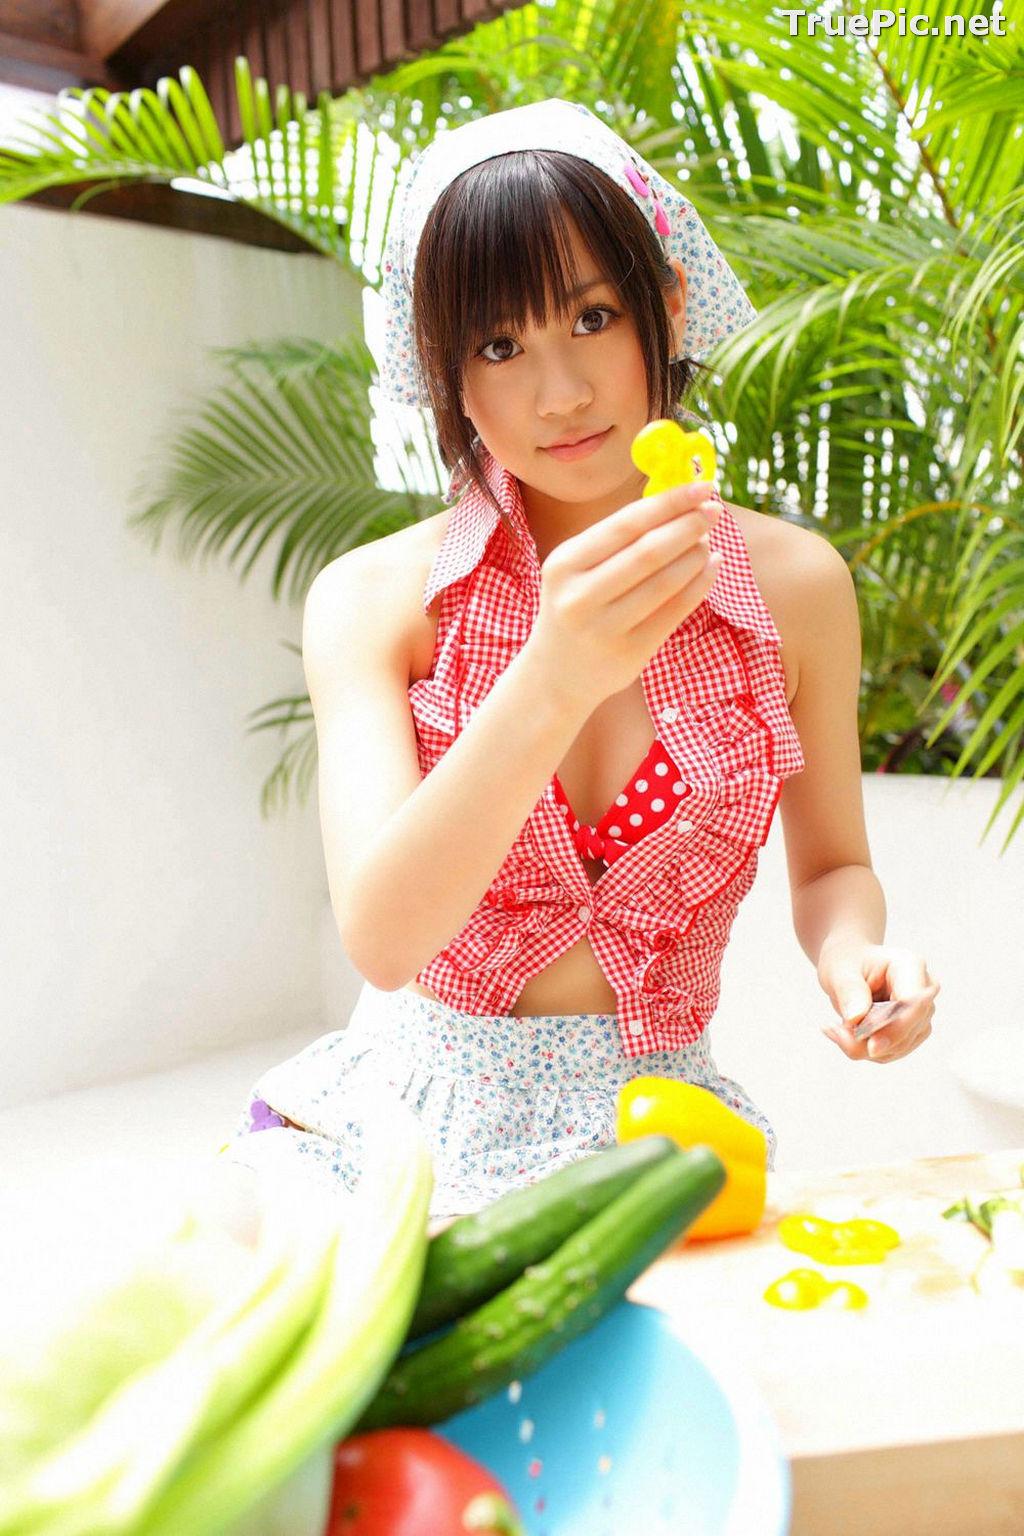 Image [YS Web] Vol.330 - Japanese Actress and Singer - Maeda Atsuko - TruePic.net - Picture-3